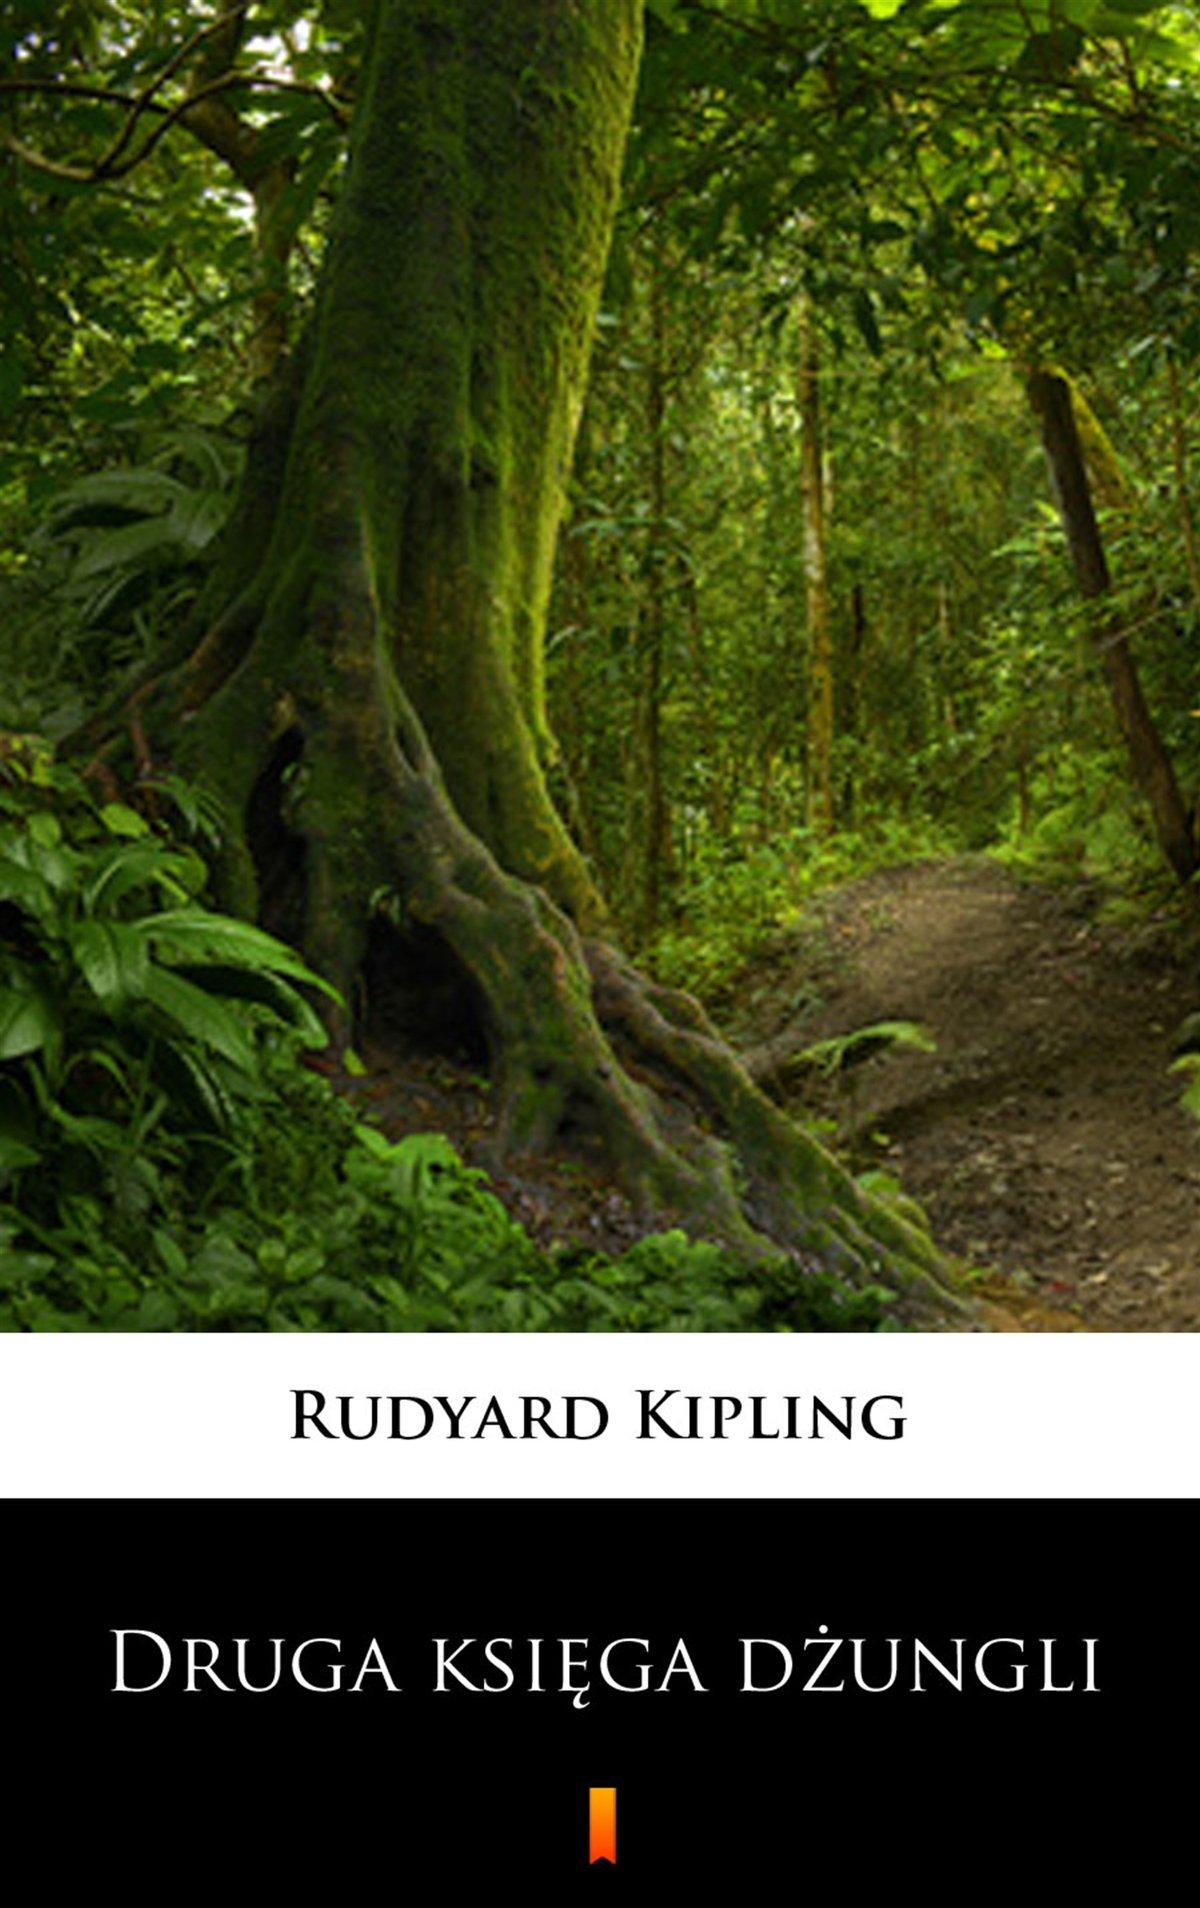 Druga księga dżungli - Ebook (Książka EPUB) do pobrania w formacie EPUB